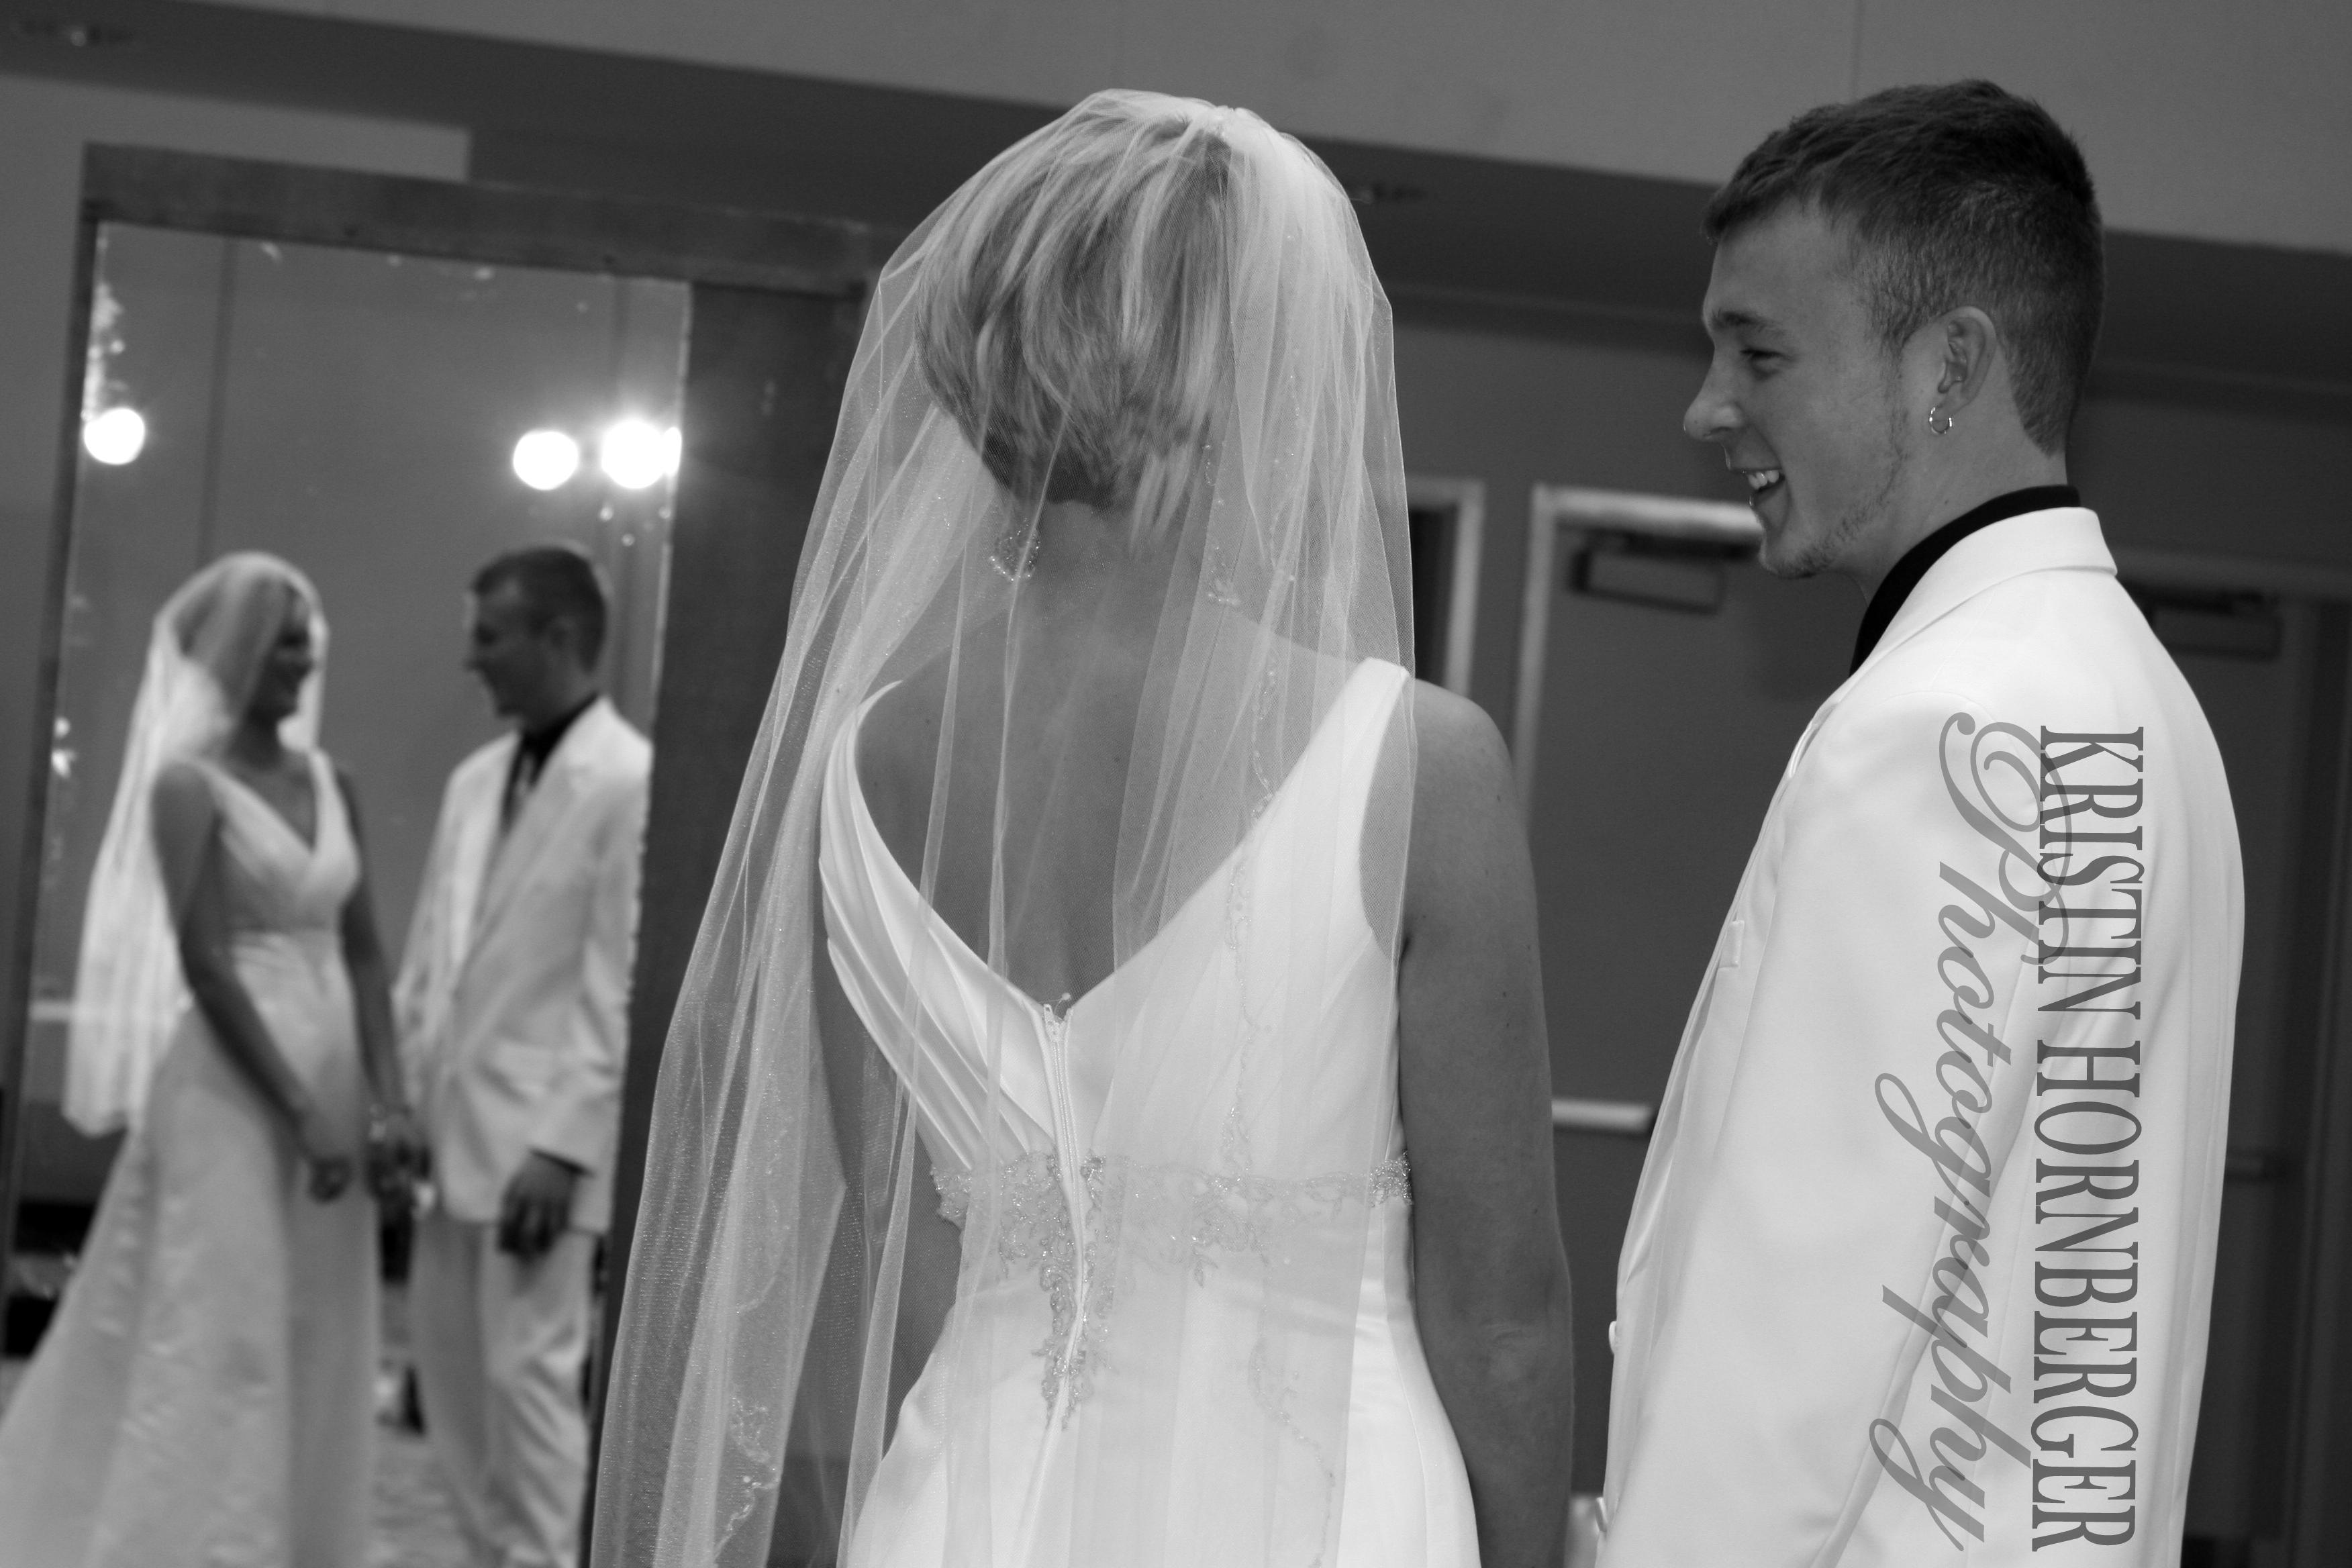 Beauty, Wedding Dresses, Fashion, dress, Men's Formal Wear, Makeup, Bride, Groom, Wedding, Hair, Tux, Kristin hornberger photography, Karenhall